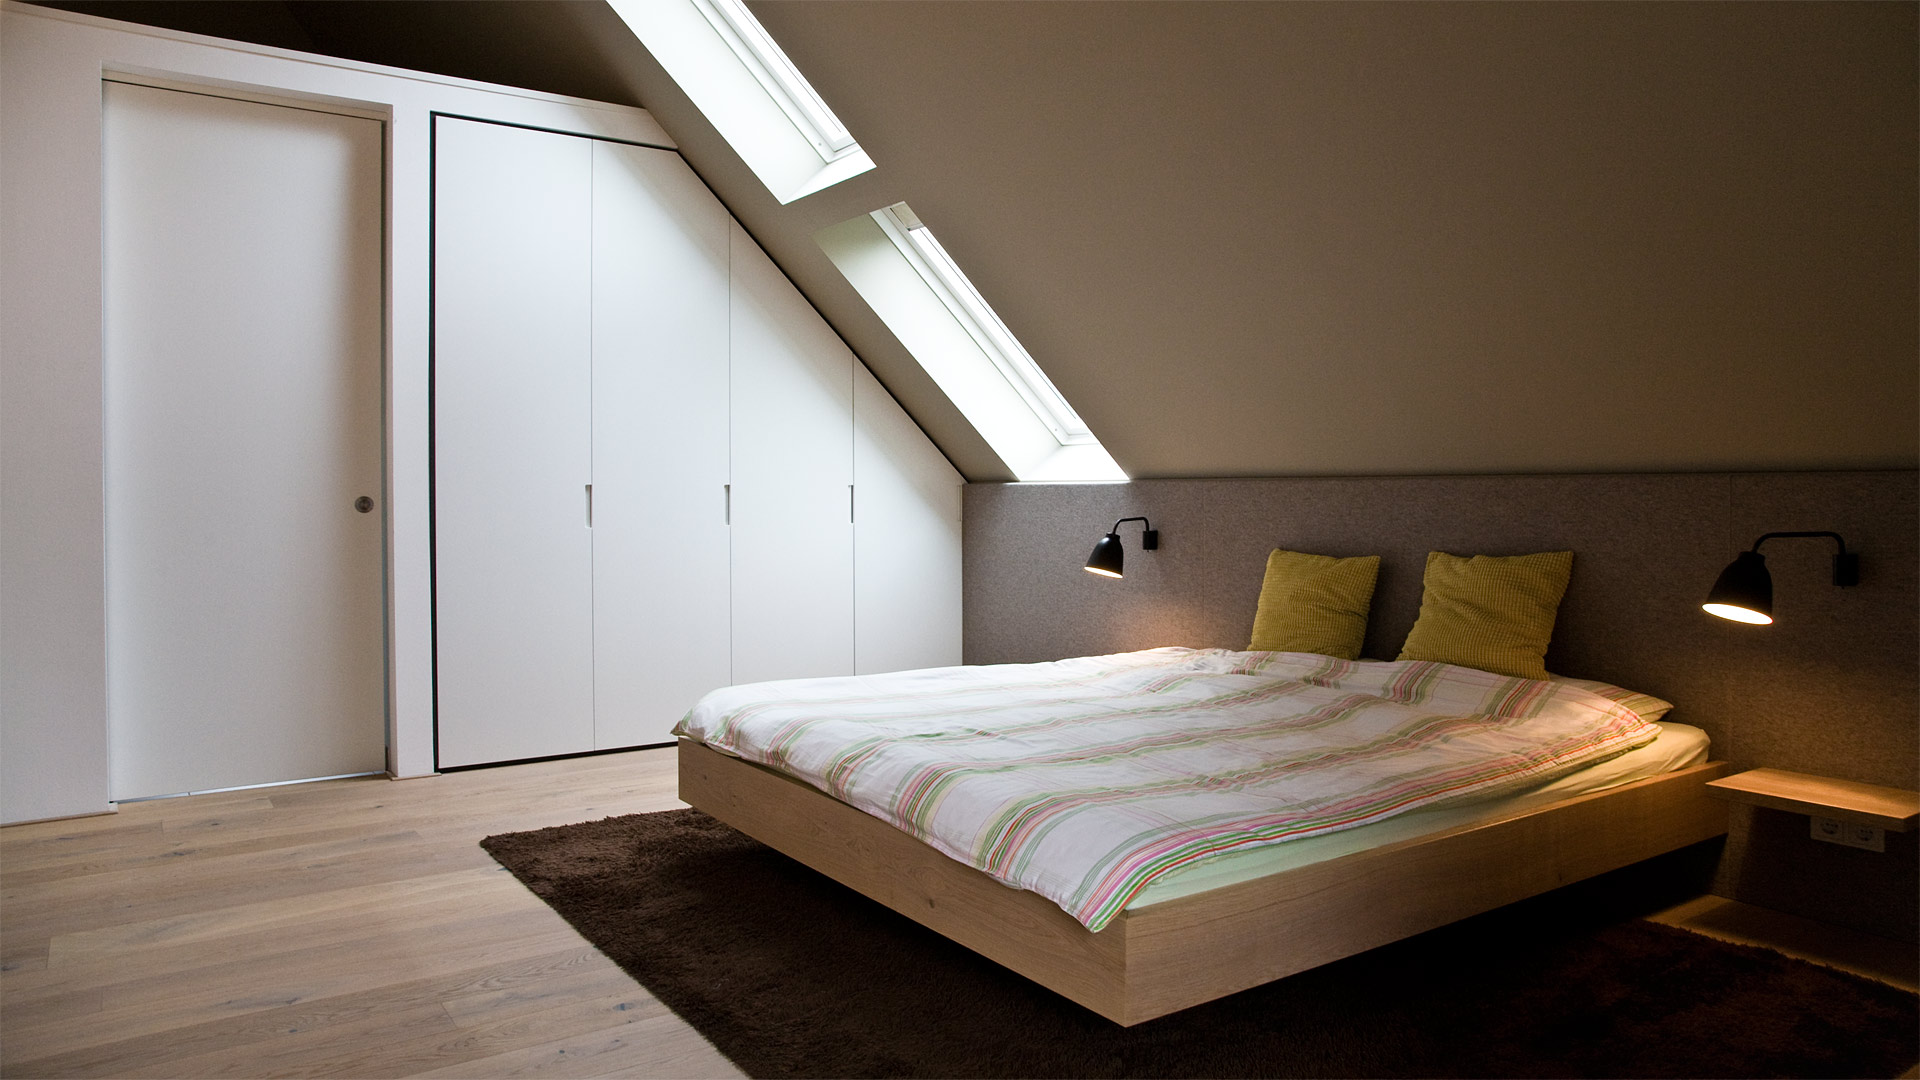 schlafzimmer bett 9 9. Black Bedroom Furniture Sets. Home Design Ideas